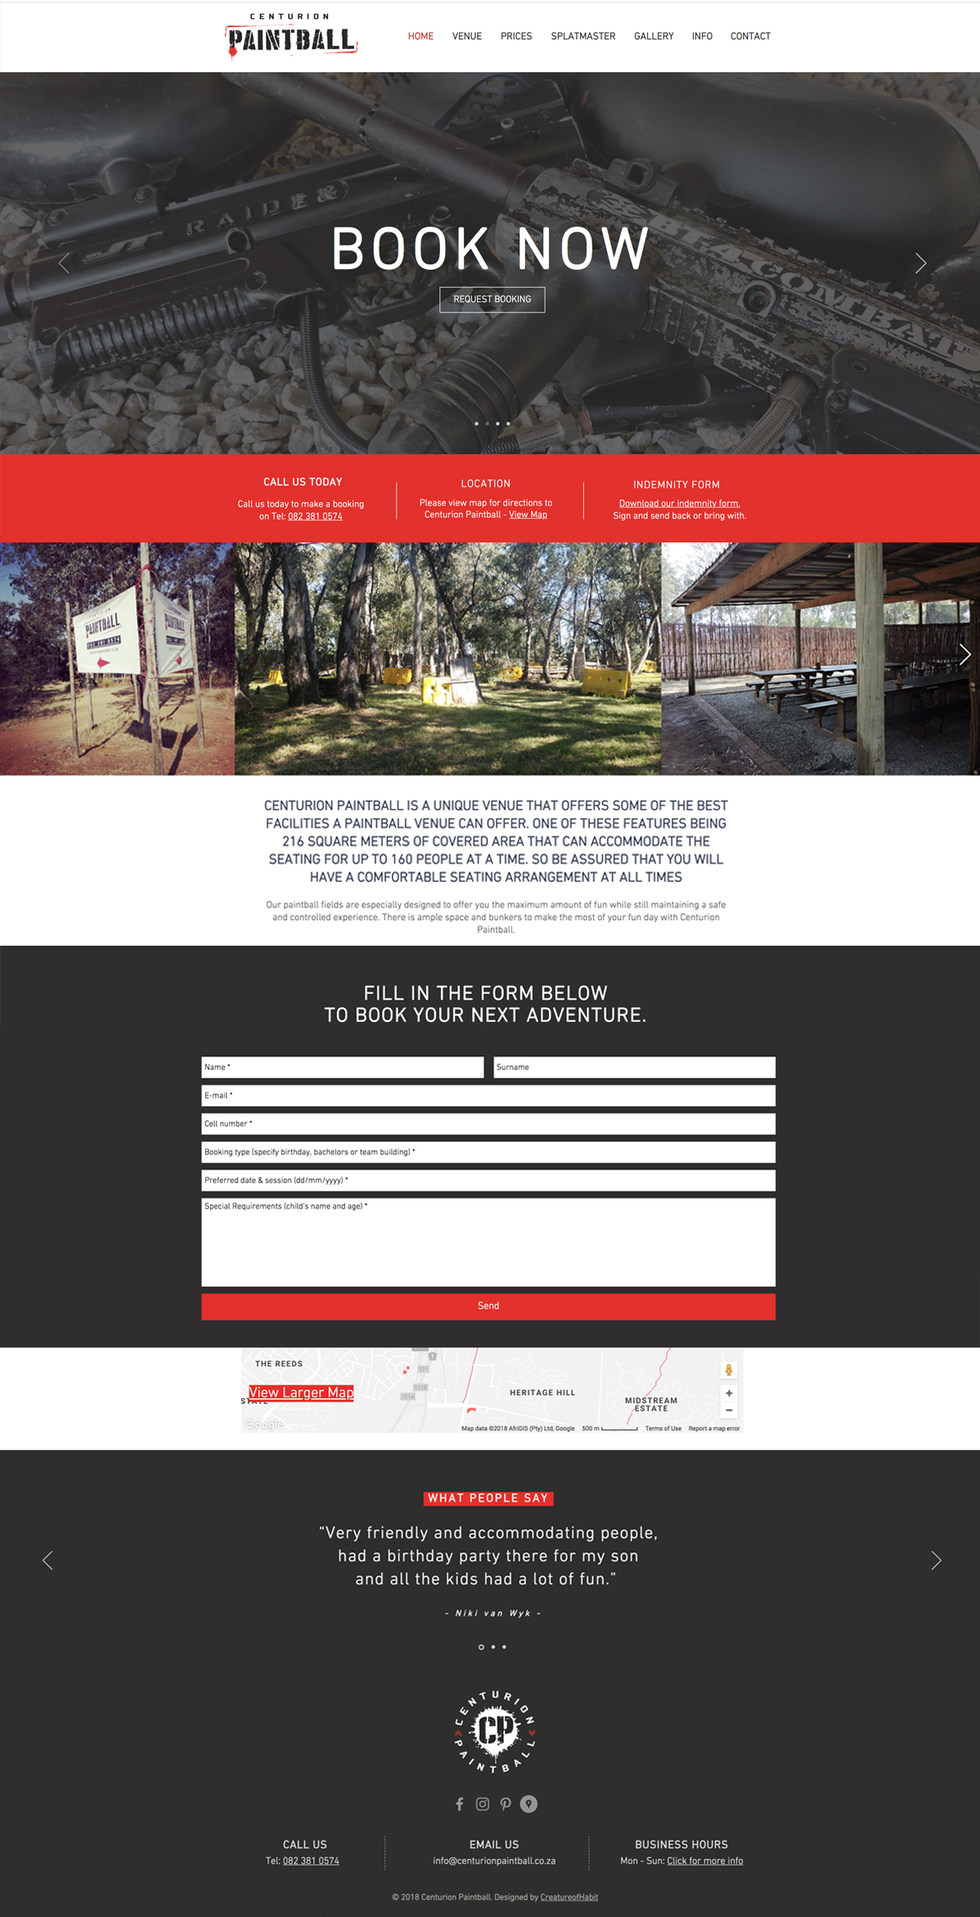 centurion-paintball-website.jpg